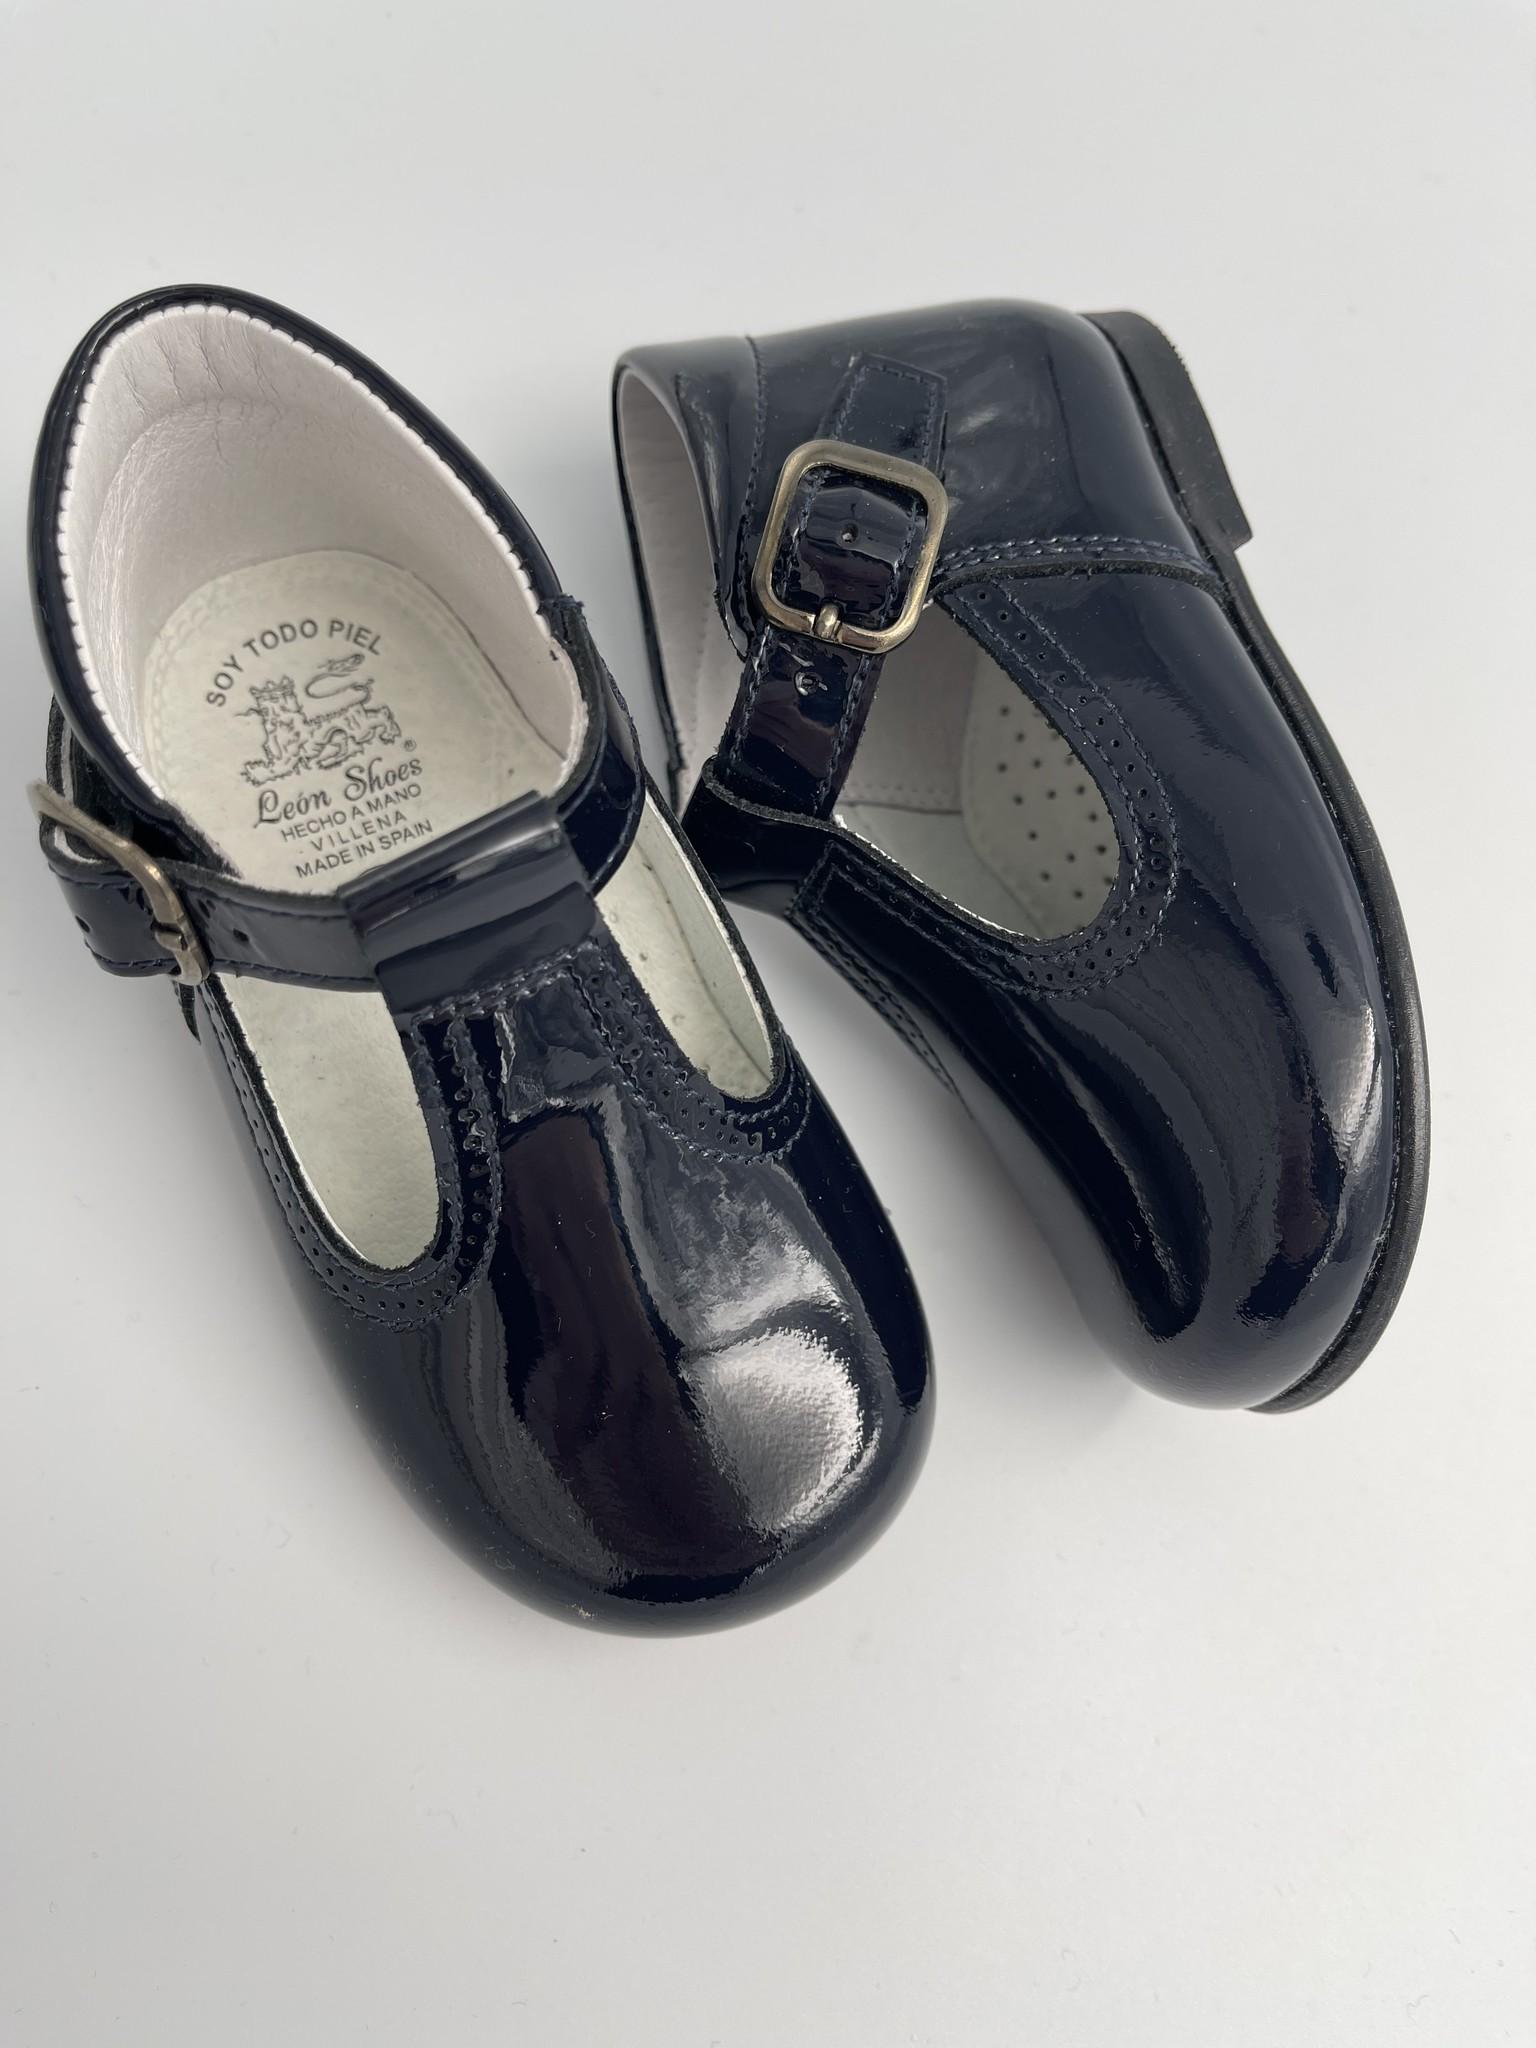 Leon Shoes Leon Shoes Marino Patent